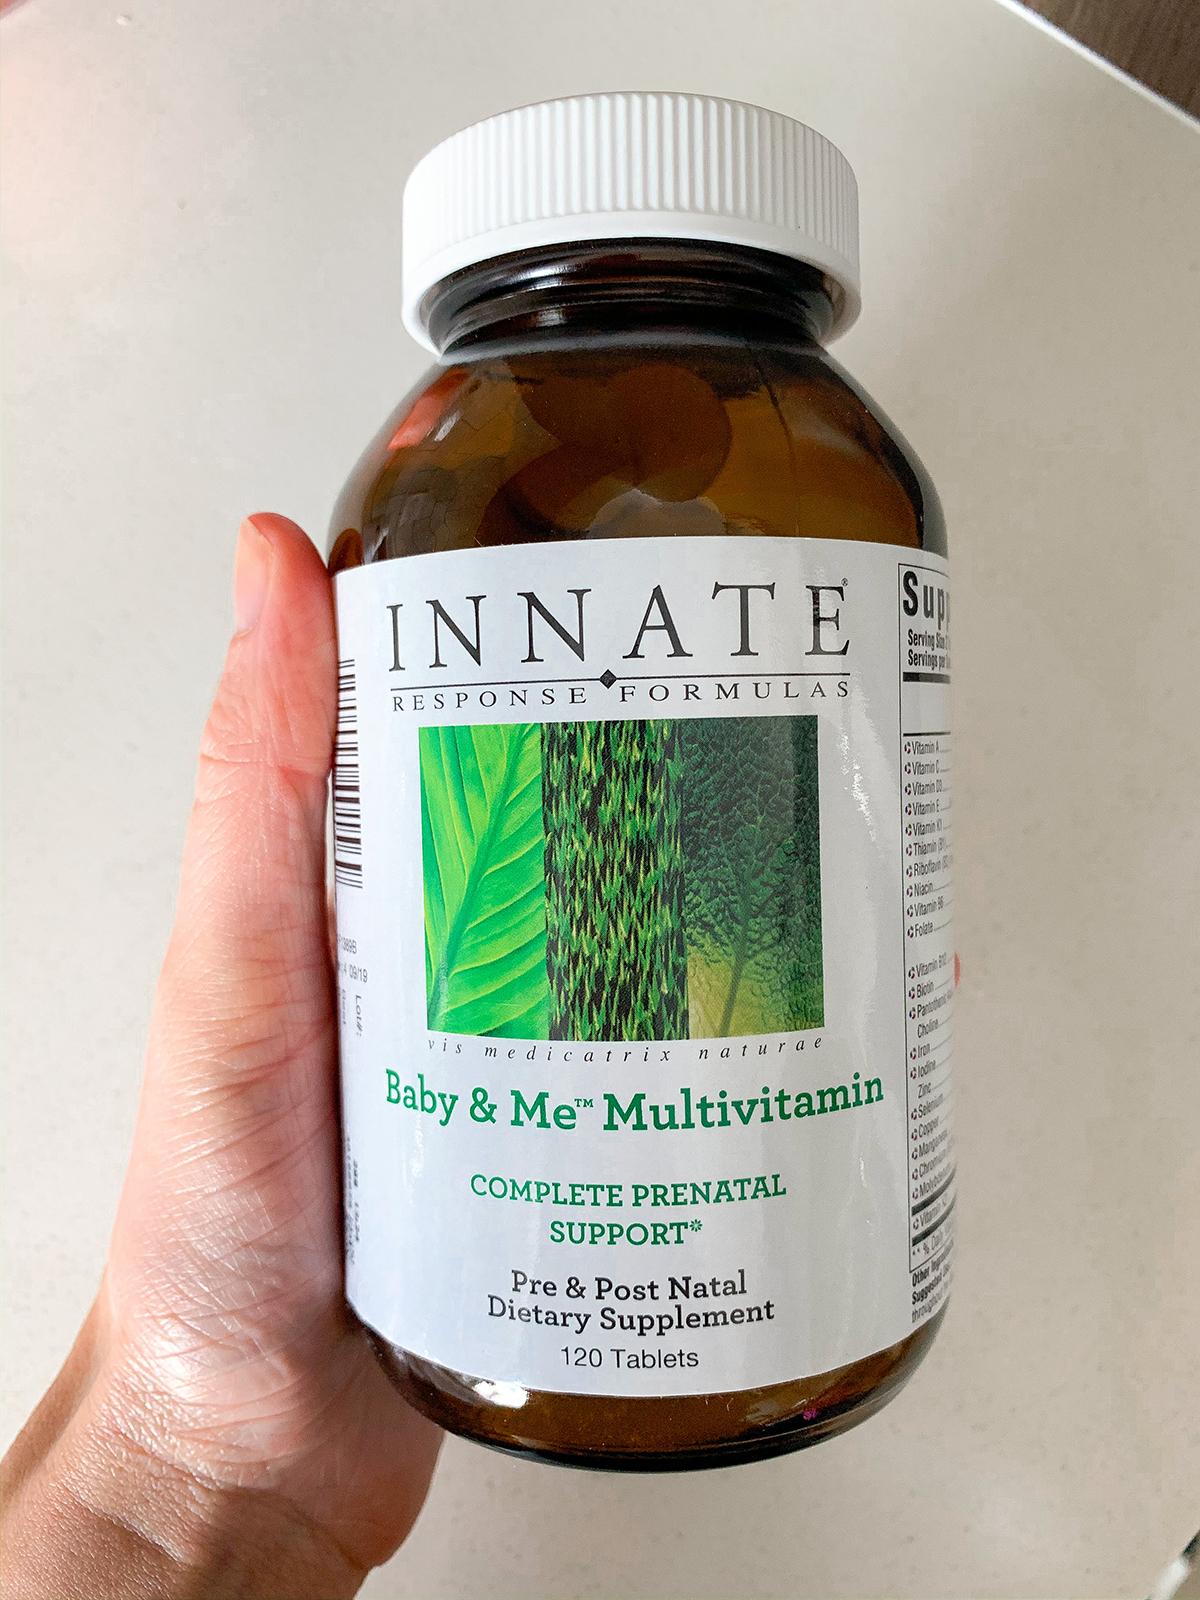 Innate Response Formulas Baby Me Multivitamin